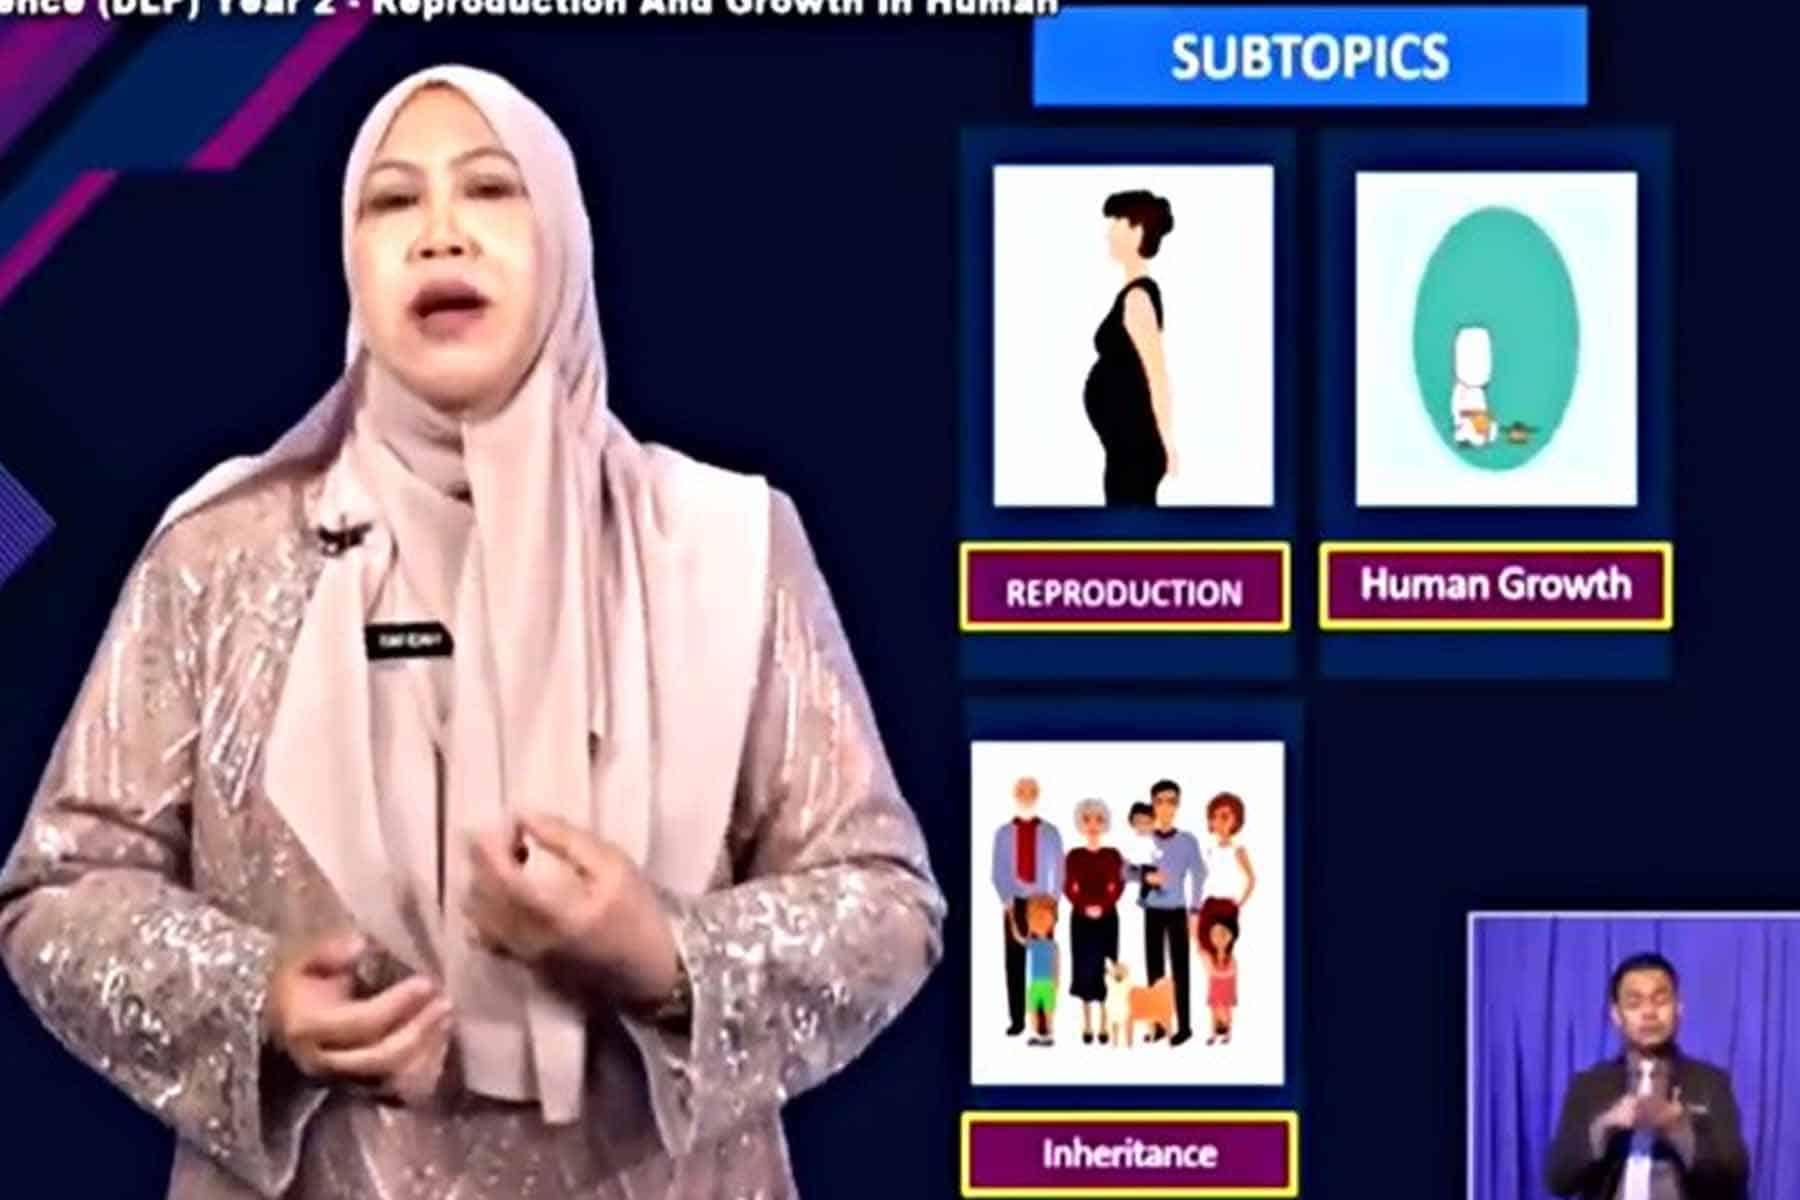 Kecam guru sains DidikTV boleh dianggap perbuatan buli siber, kata menteri